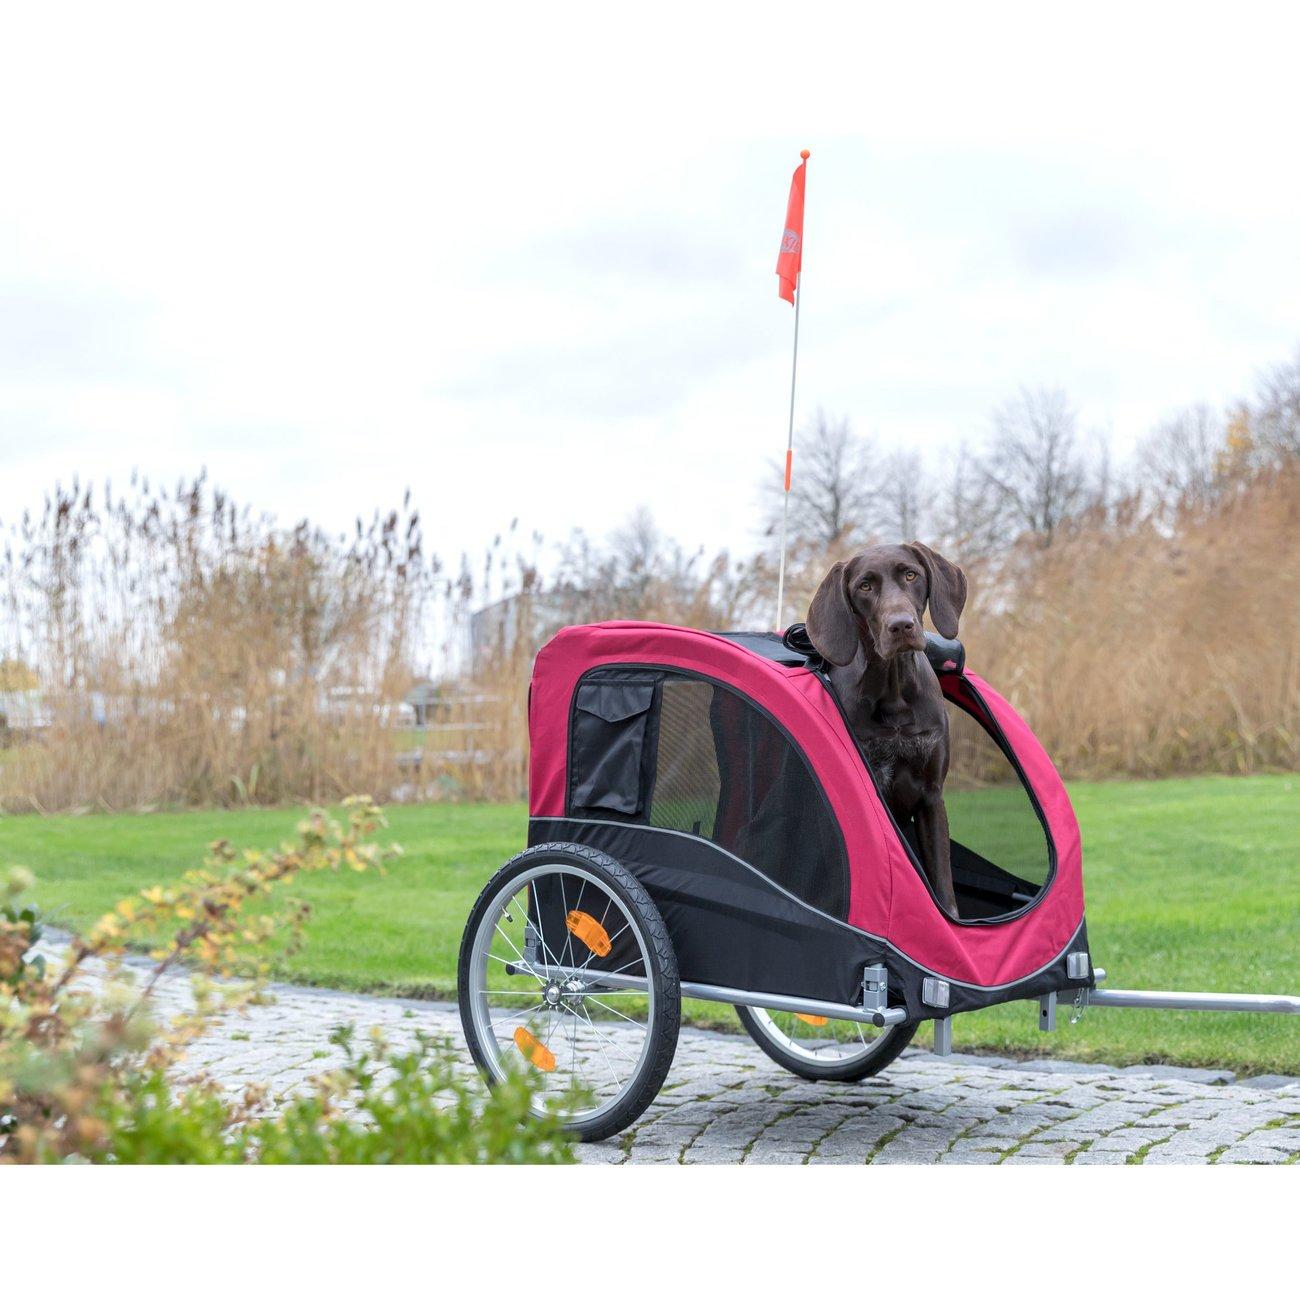 Fahrradanhänger für Hunde Bild 13